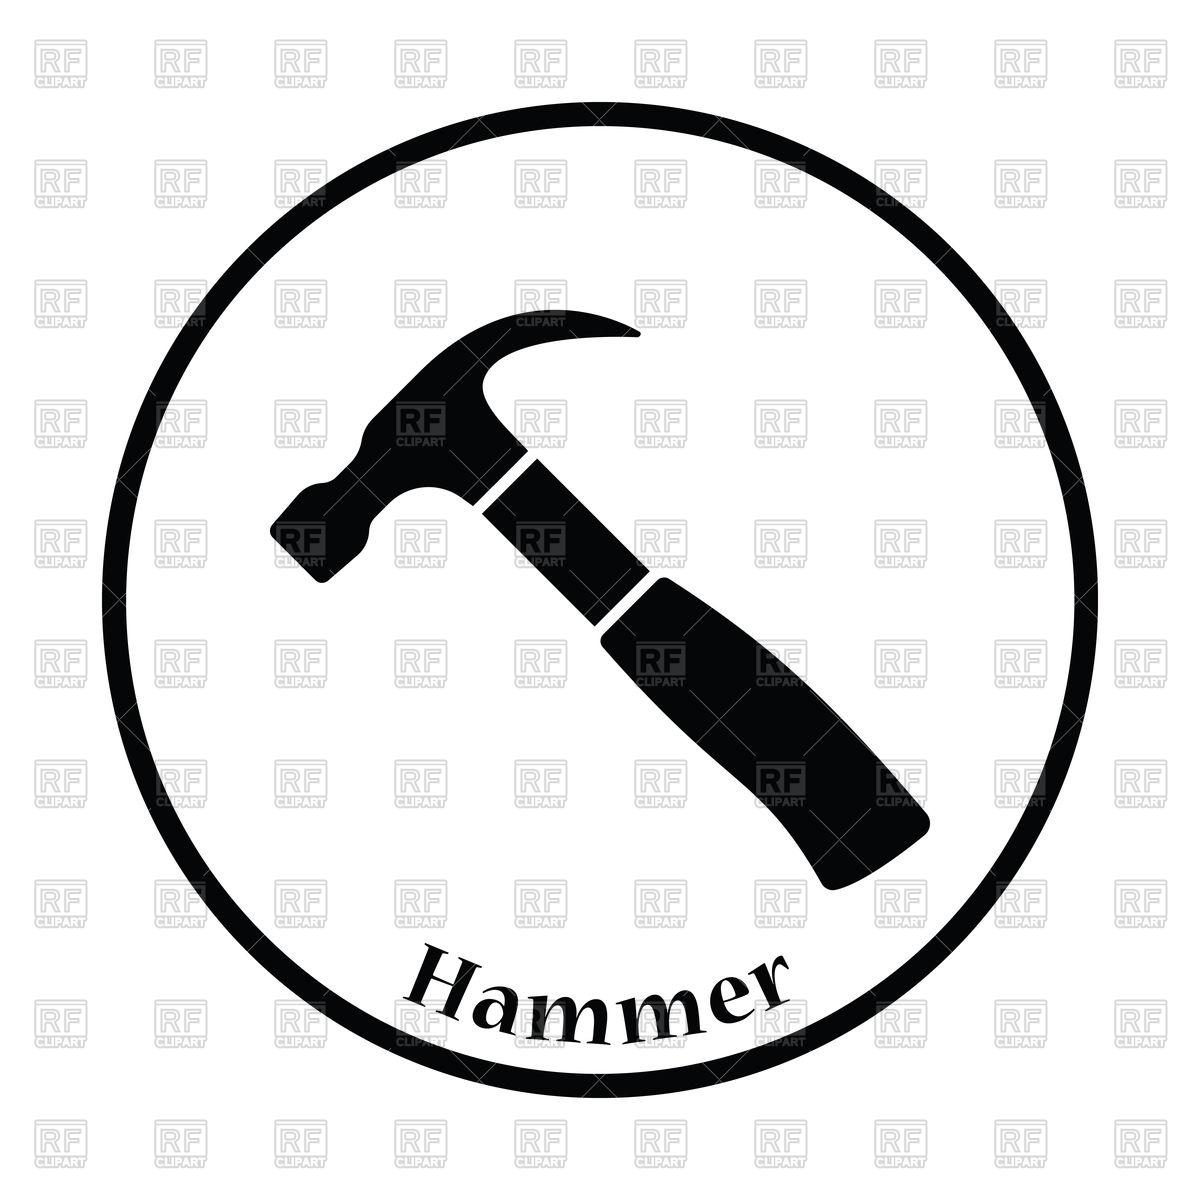 1200x1200 Thin Circle Design Icon Of Hammer Vector Image Vector Artwork Of